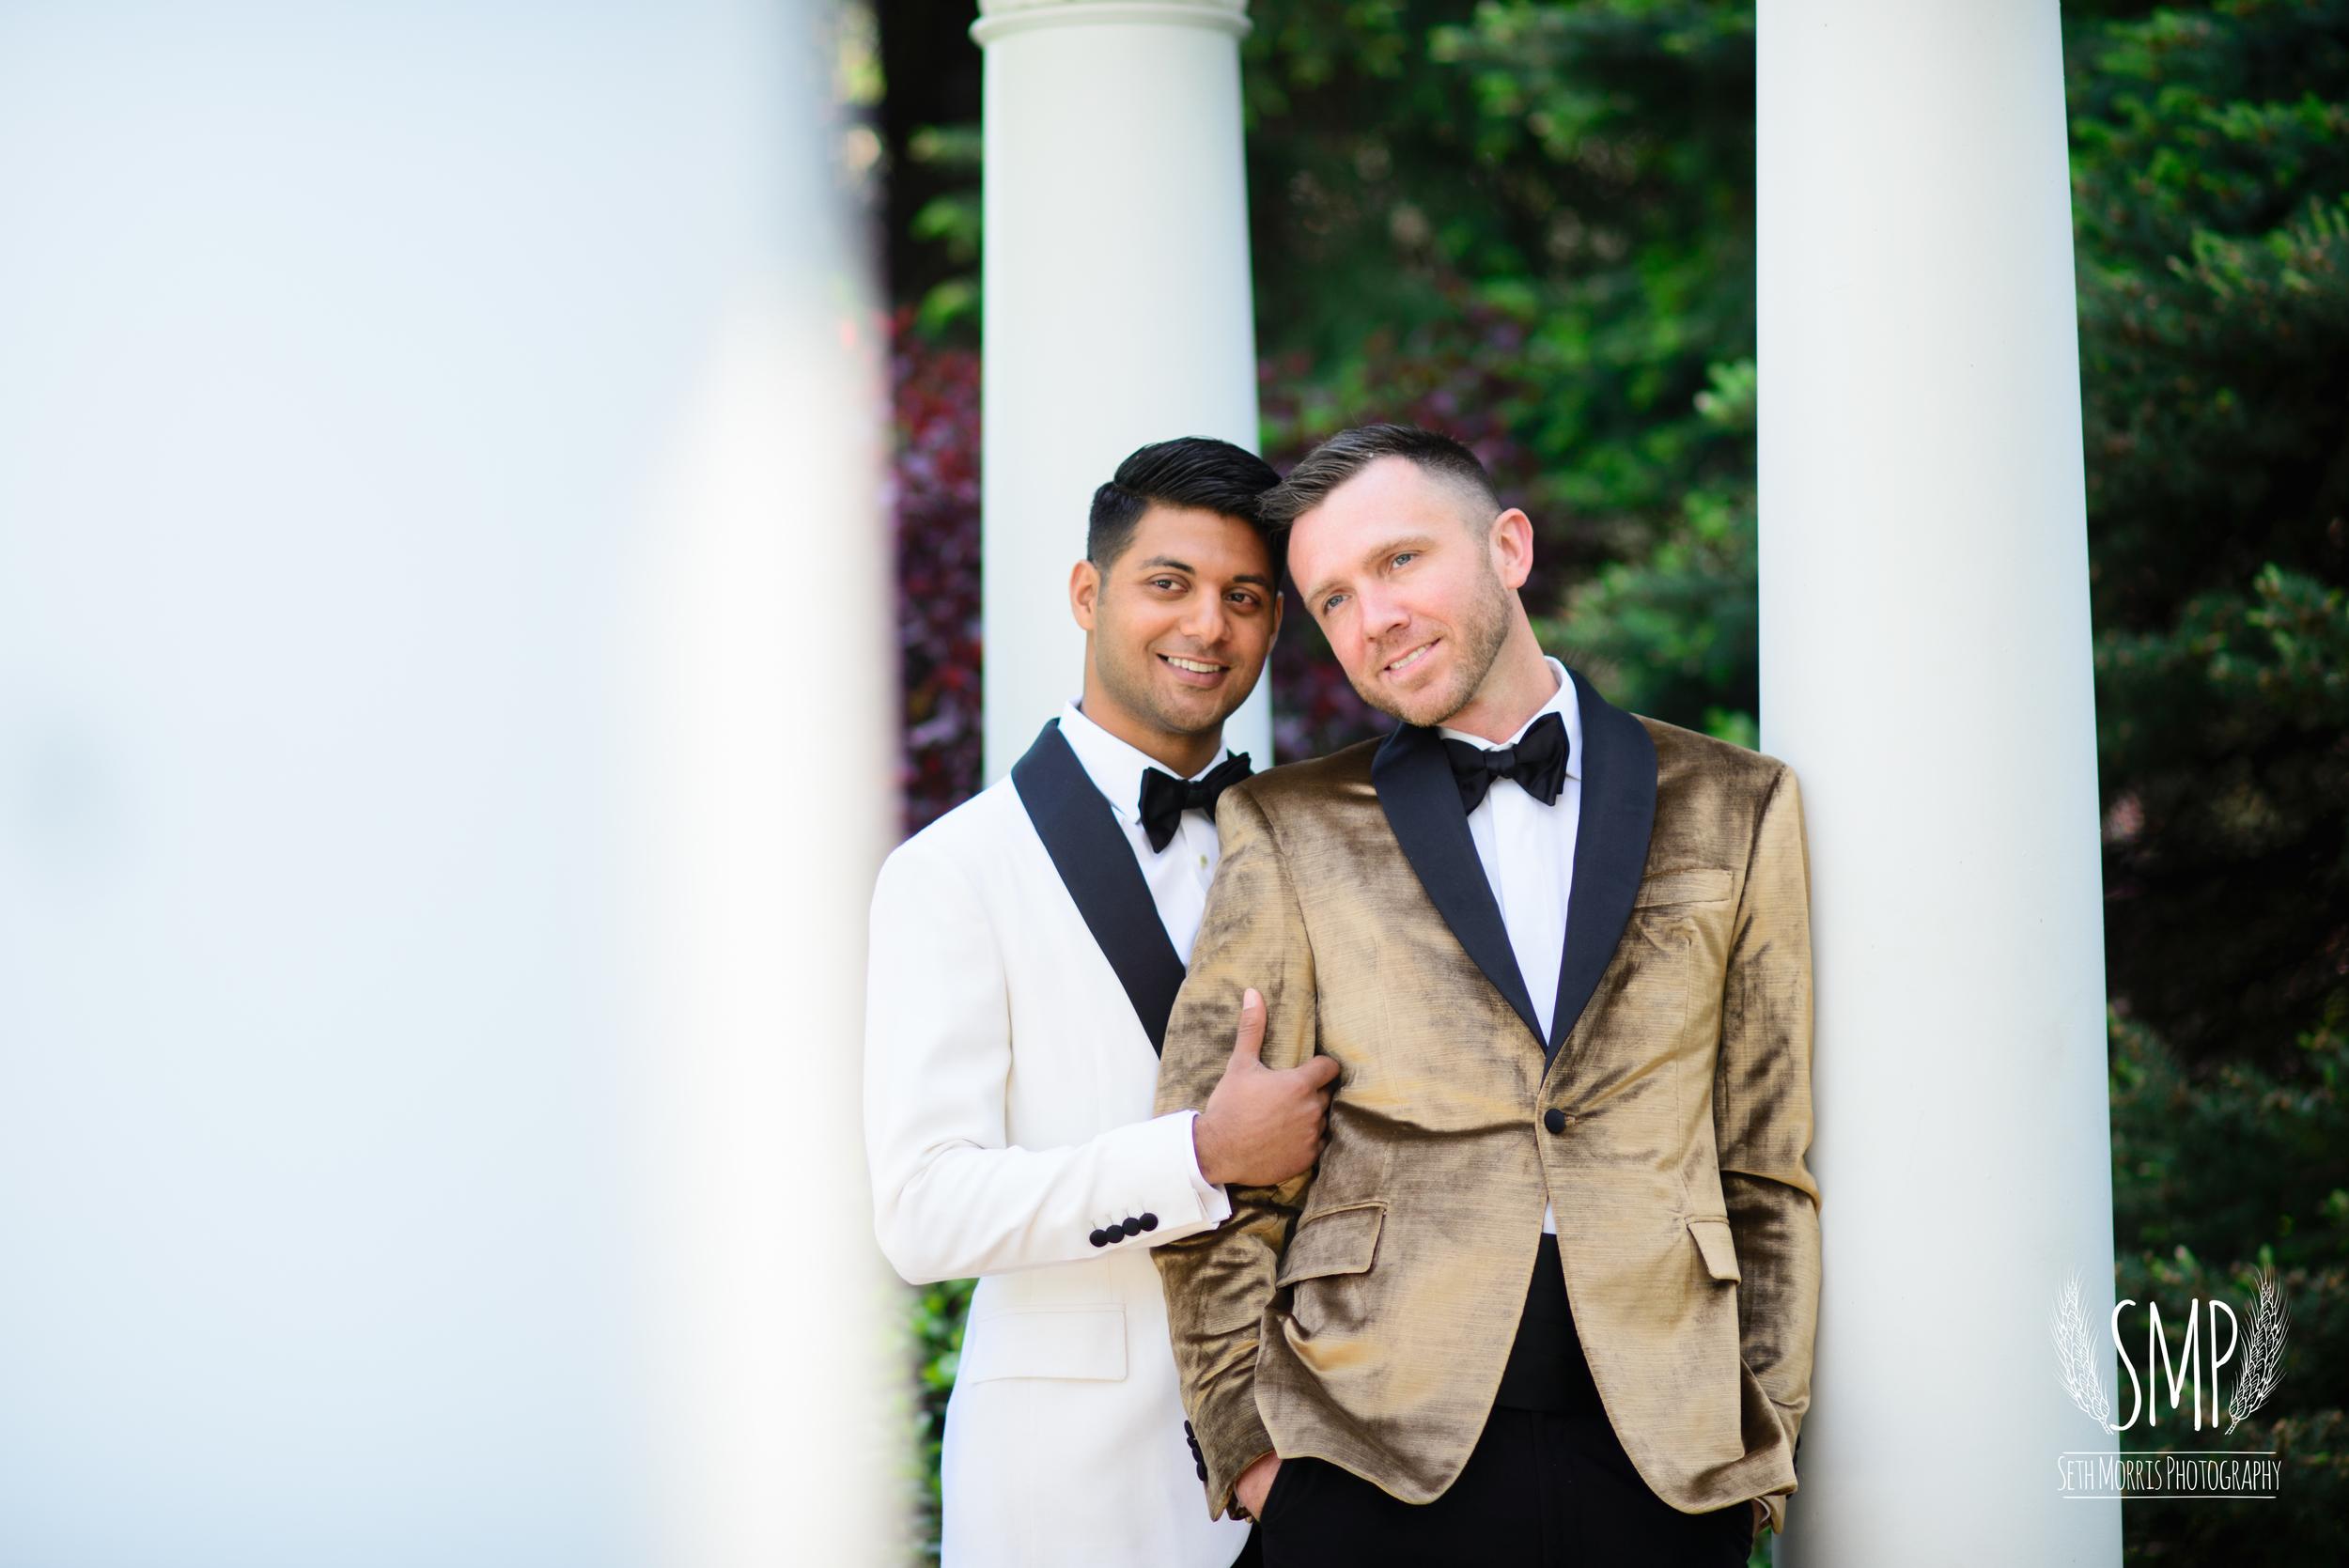 same-sex-wedding-photographer-chicago-illinois-26.jpg